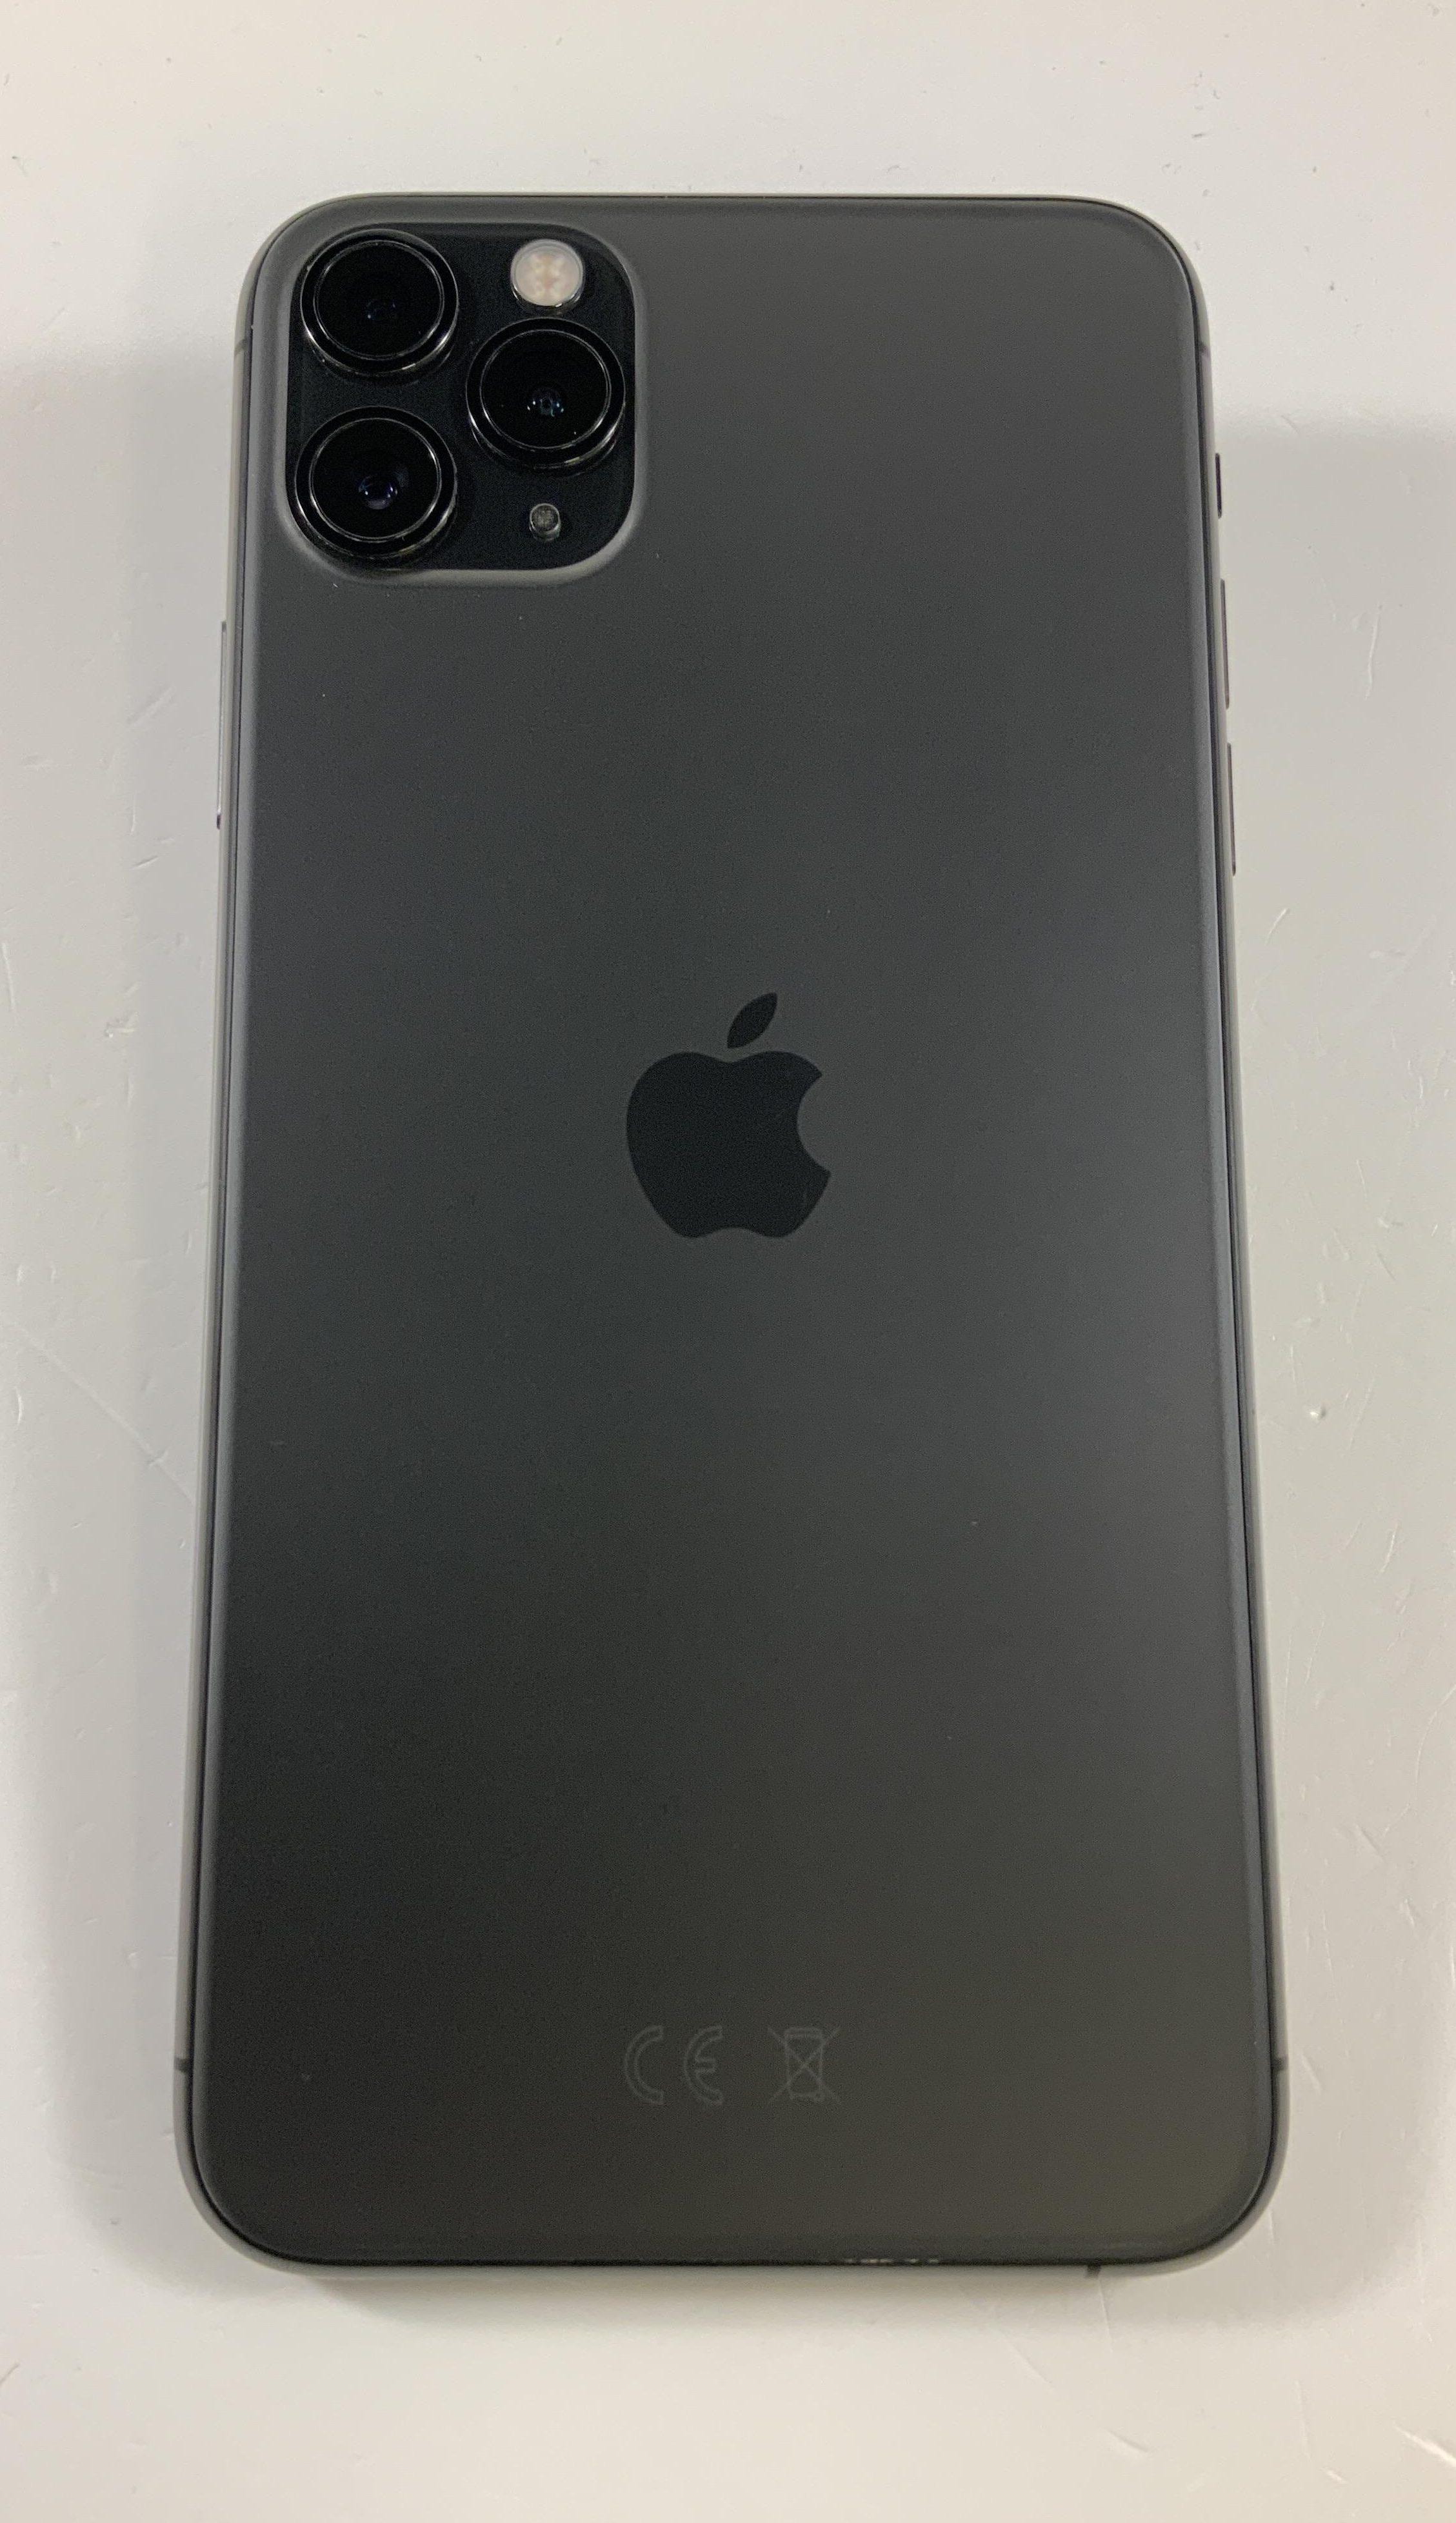 iPhone 11 Pro Max 256GB, 256GB, Space Gray, Kuva 2